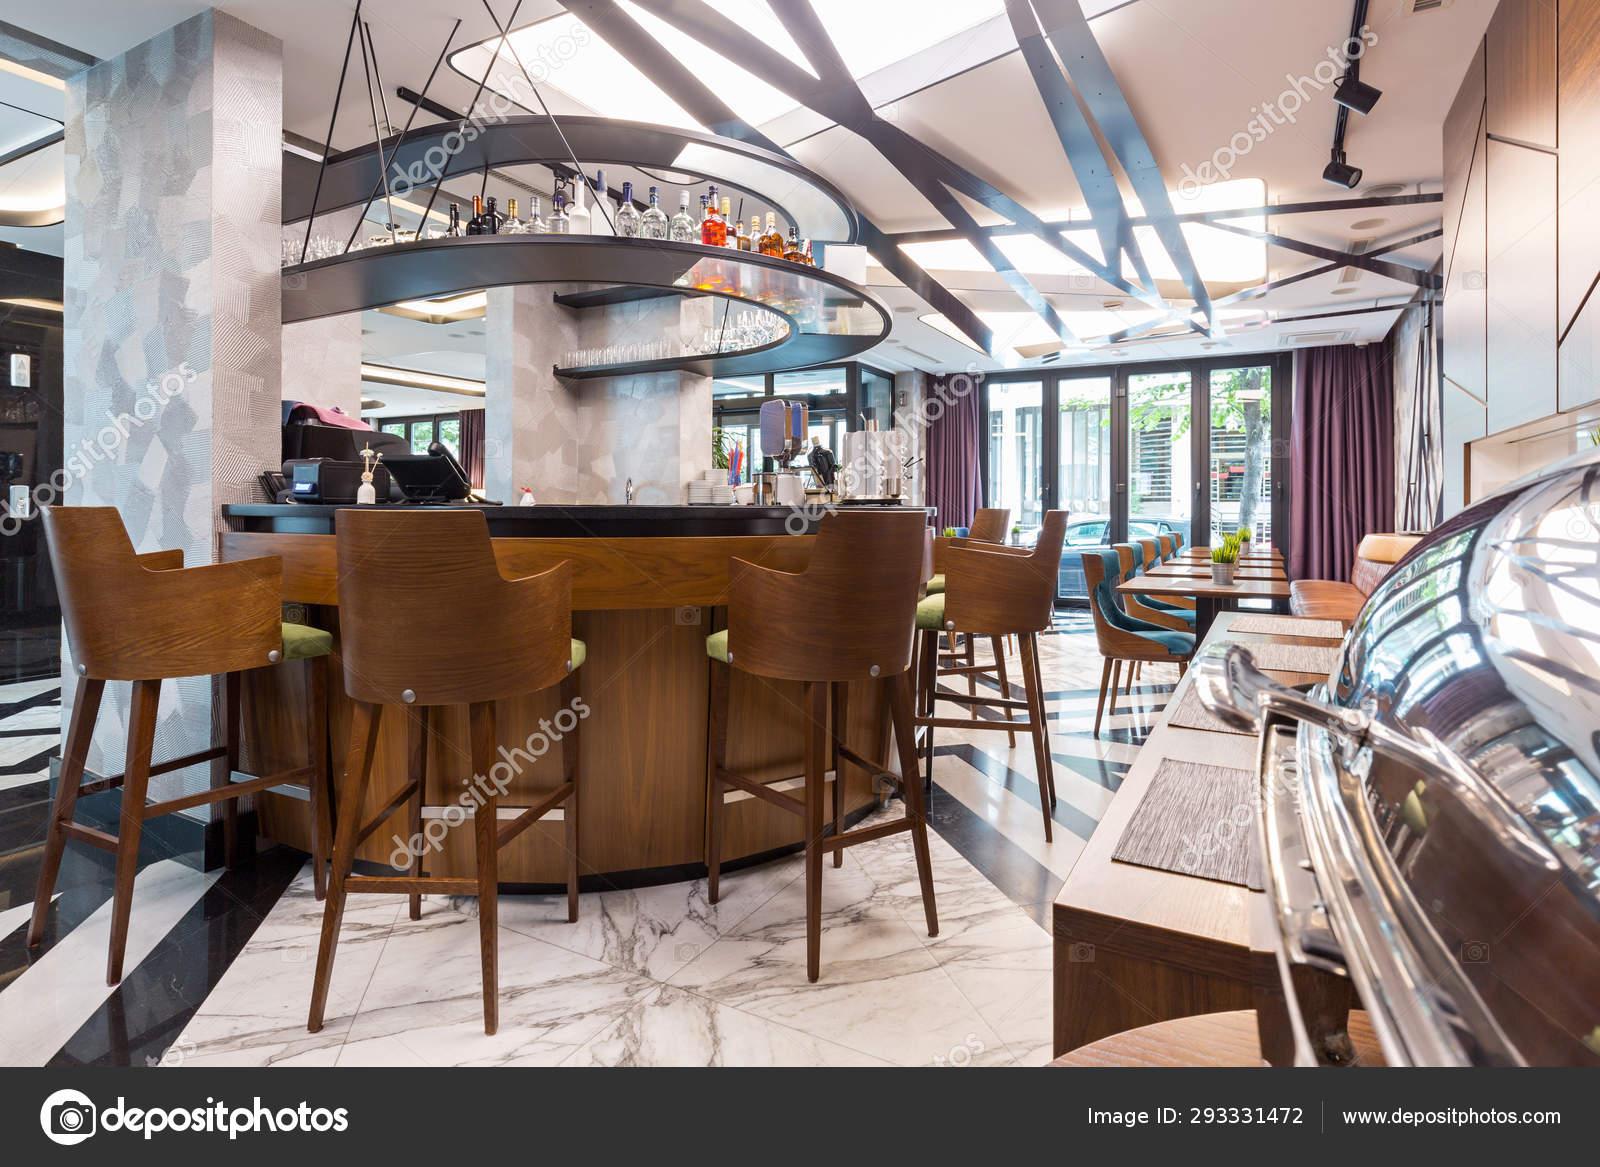 Interior Of A Modern Hotel Lounge Cafe Bar Restaurant Stock Photo C Rilueda 293331472